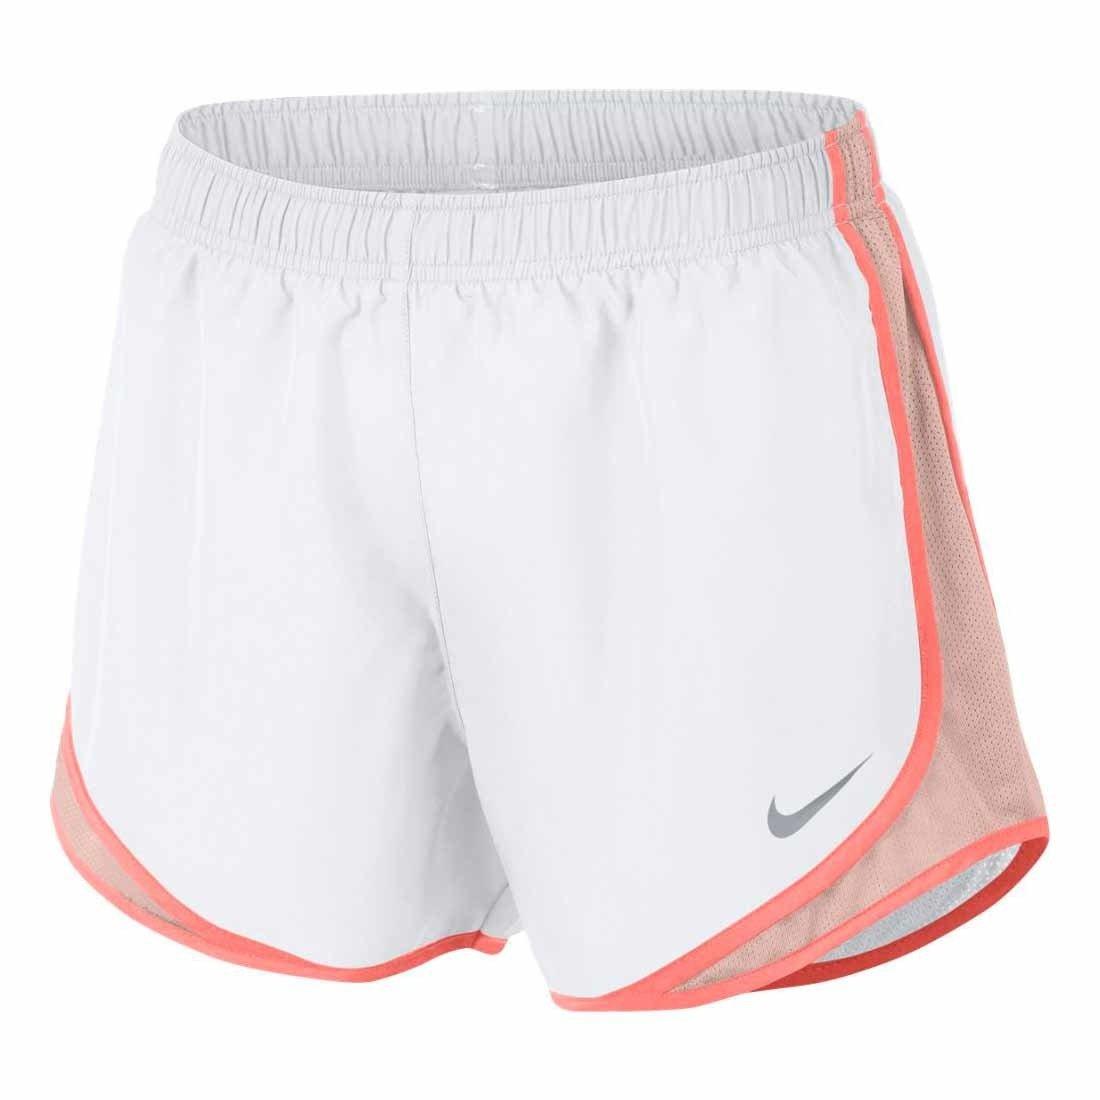 NIKE Womens Running Fitness Shorts (White/Crimson Tint, Small)